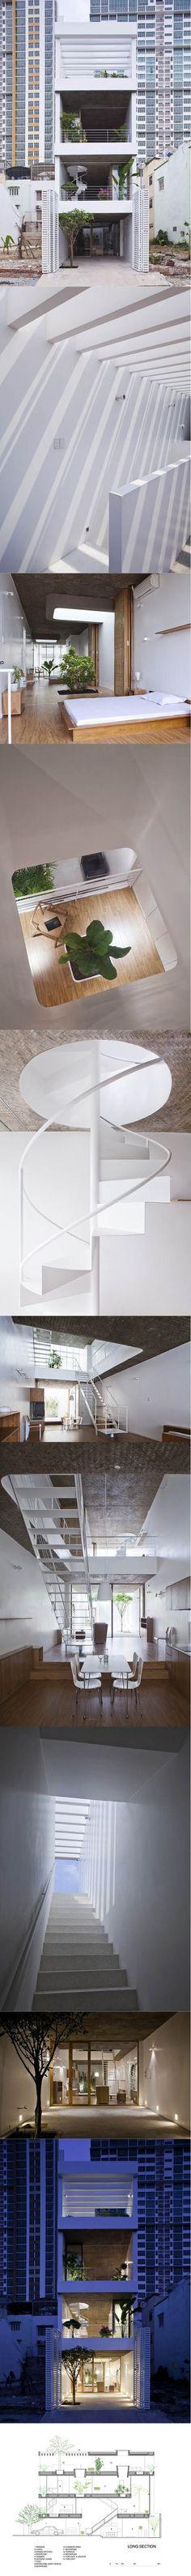 2009 Sanuki + Nishizawa - Anh House / Ho-Chi-Min City - Vietnam / white / wood concrete / minimalism / Japan